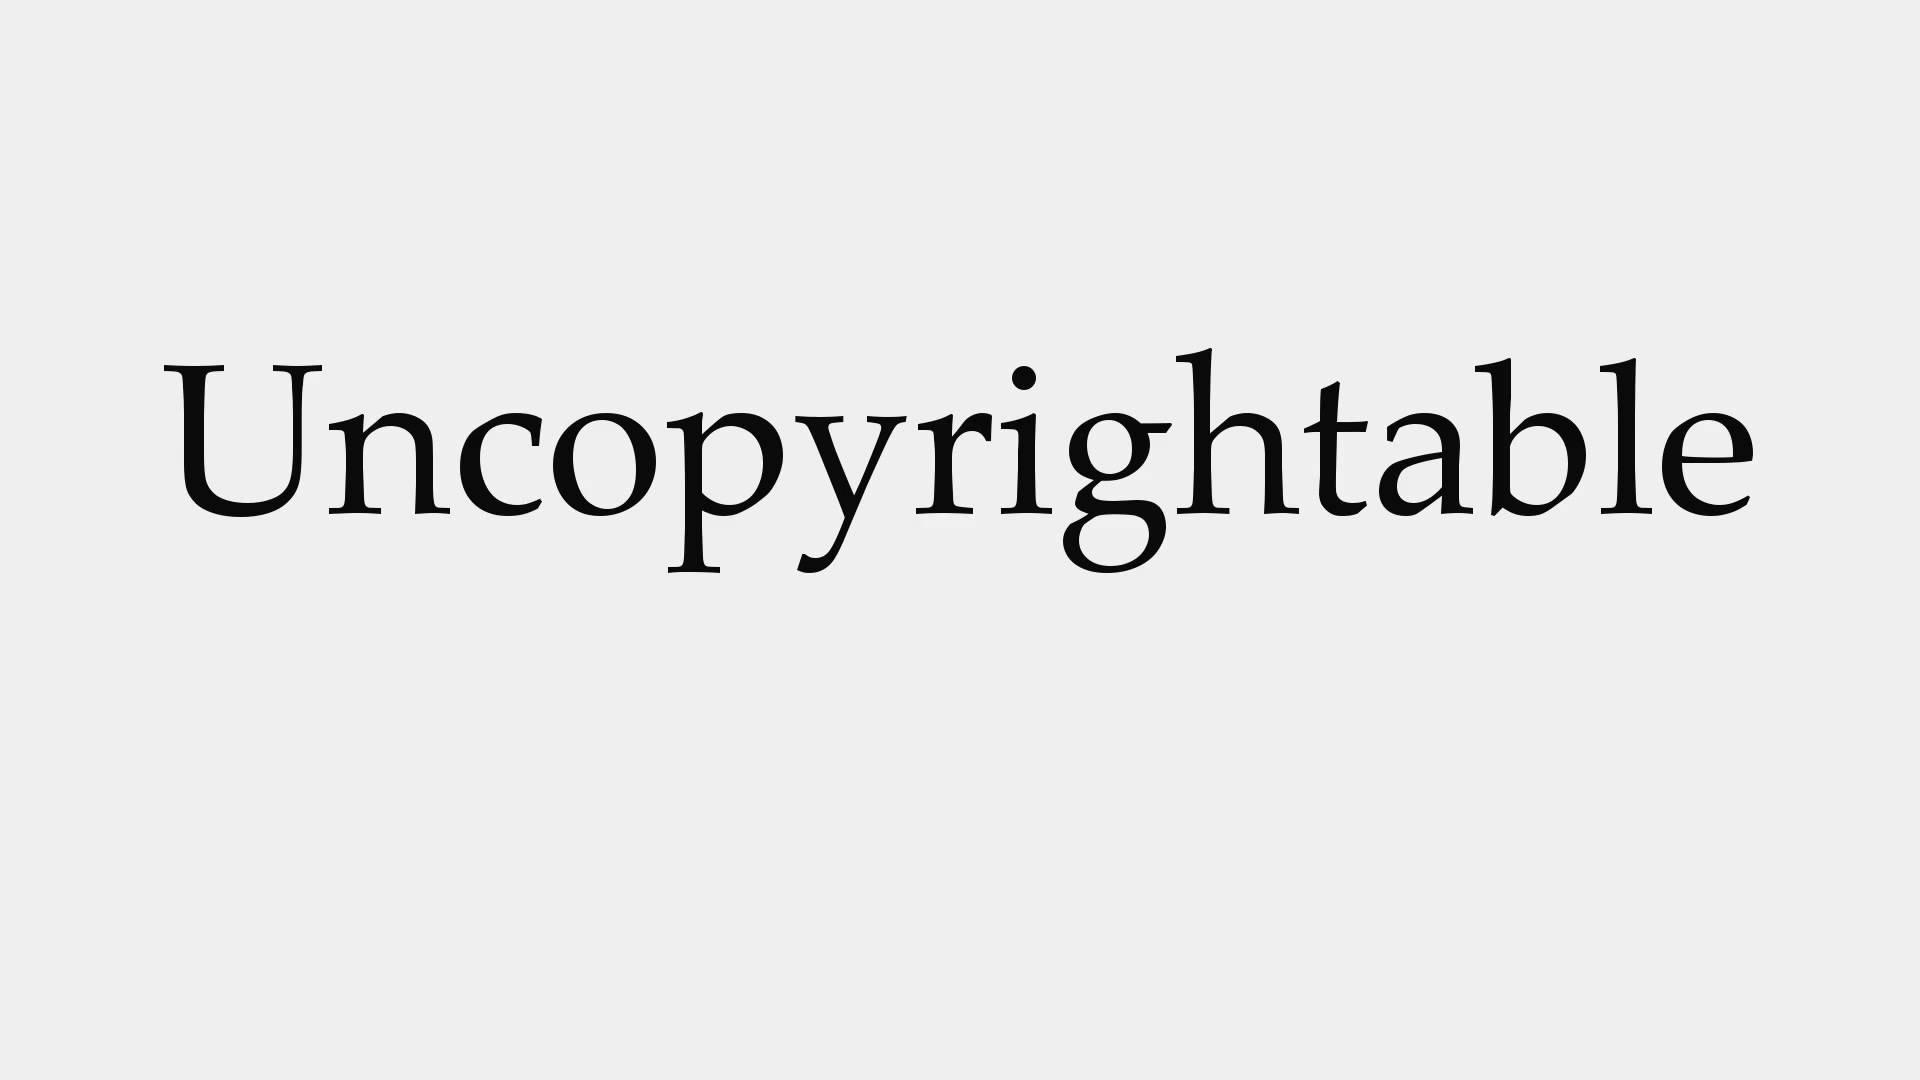 uncopyrightable